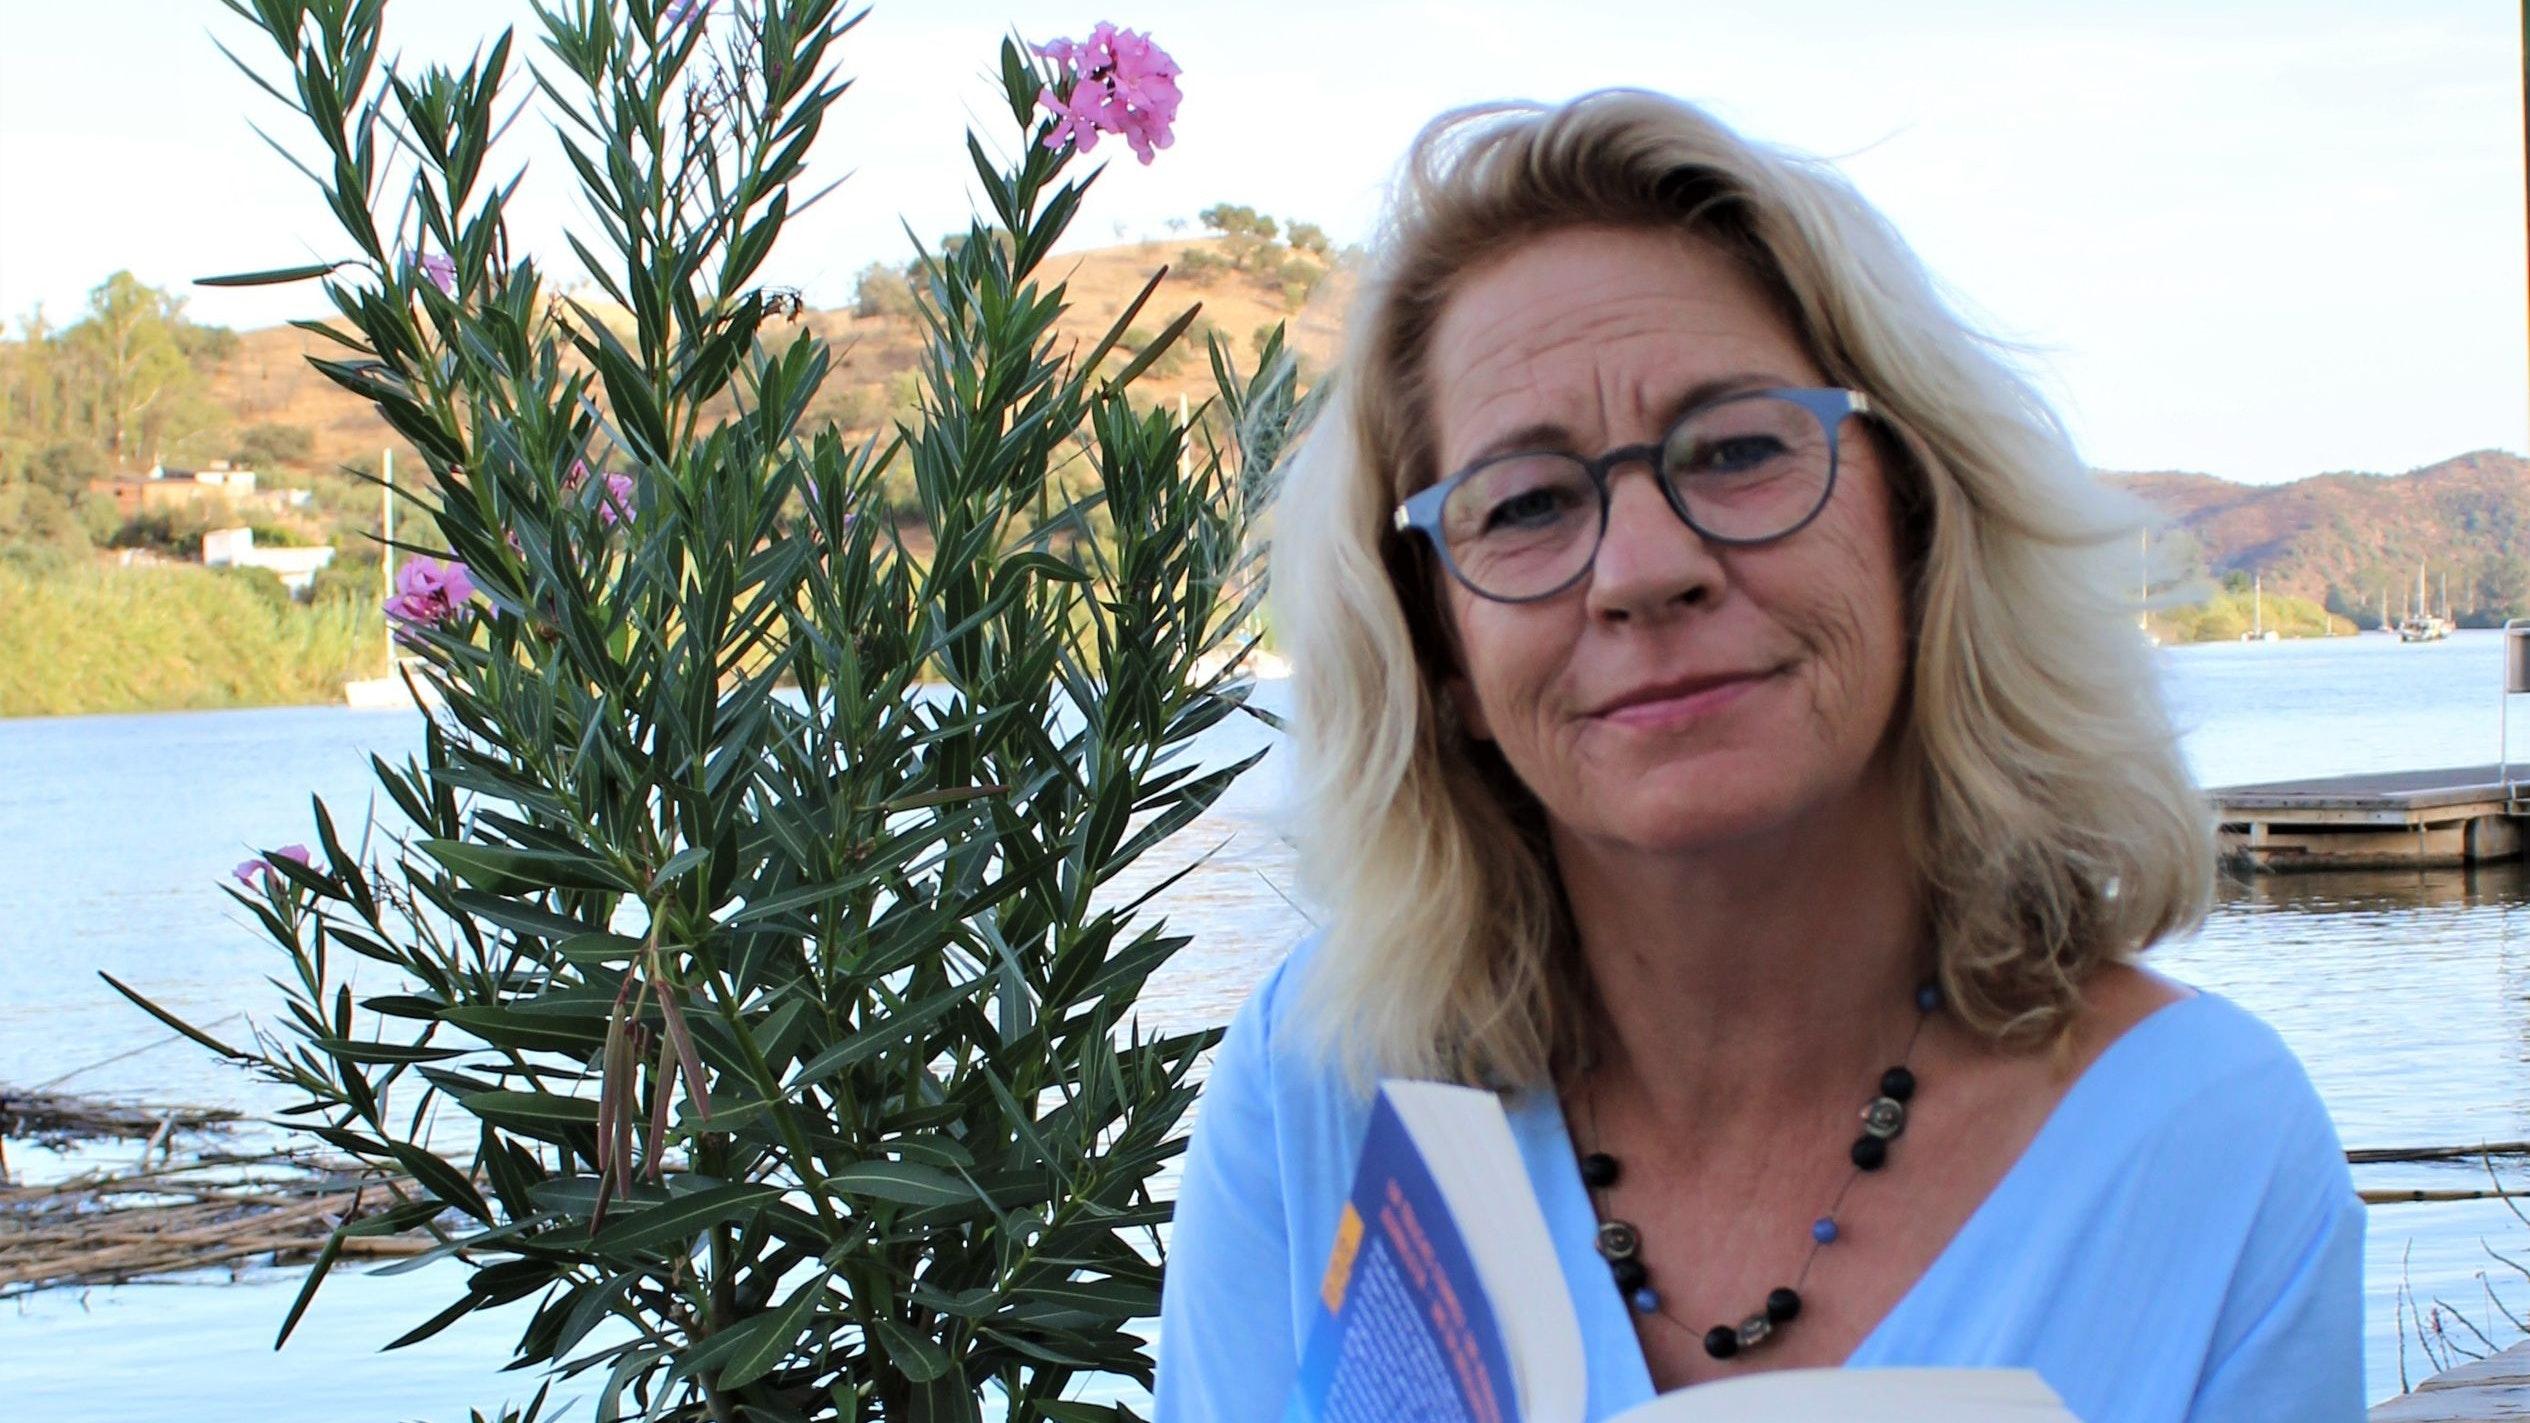 Algarve mit neuem Algarve-Krimi – und der Autorin Carolina Conrad/Bettina Haskamp. Foto: Haskamp